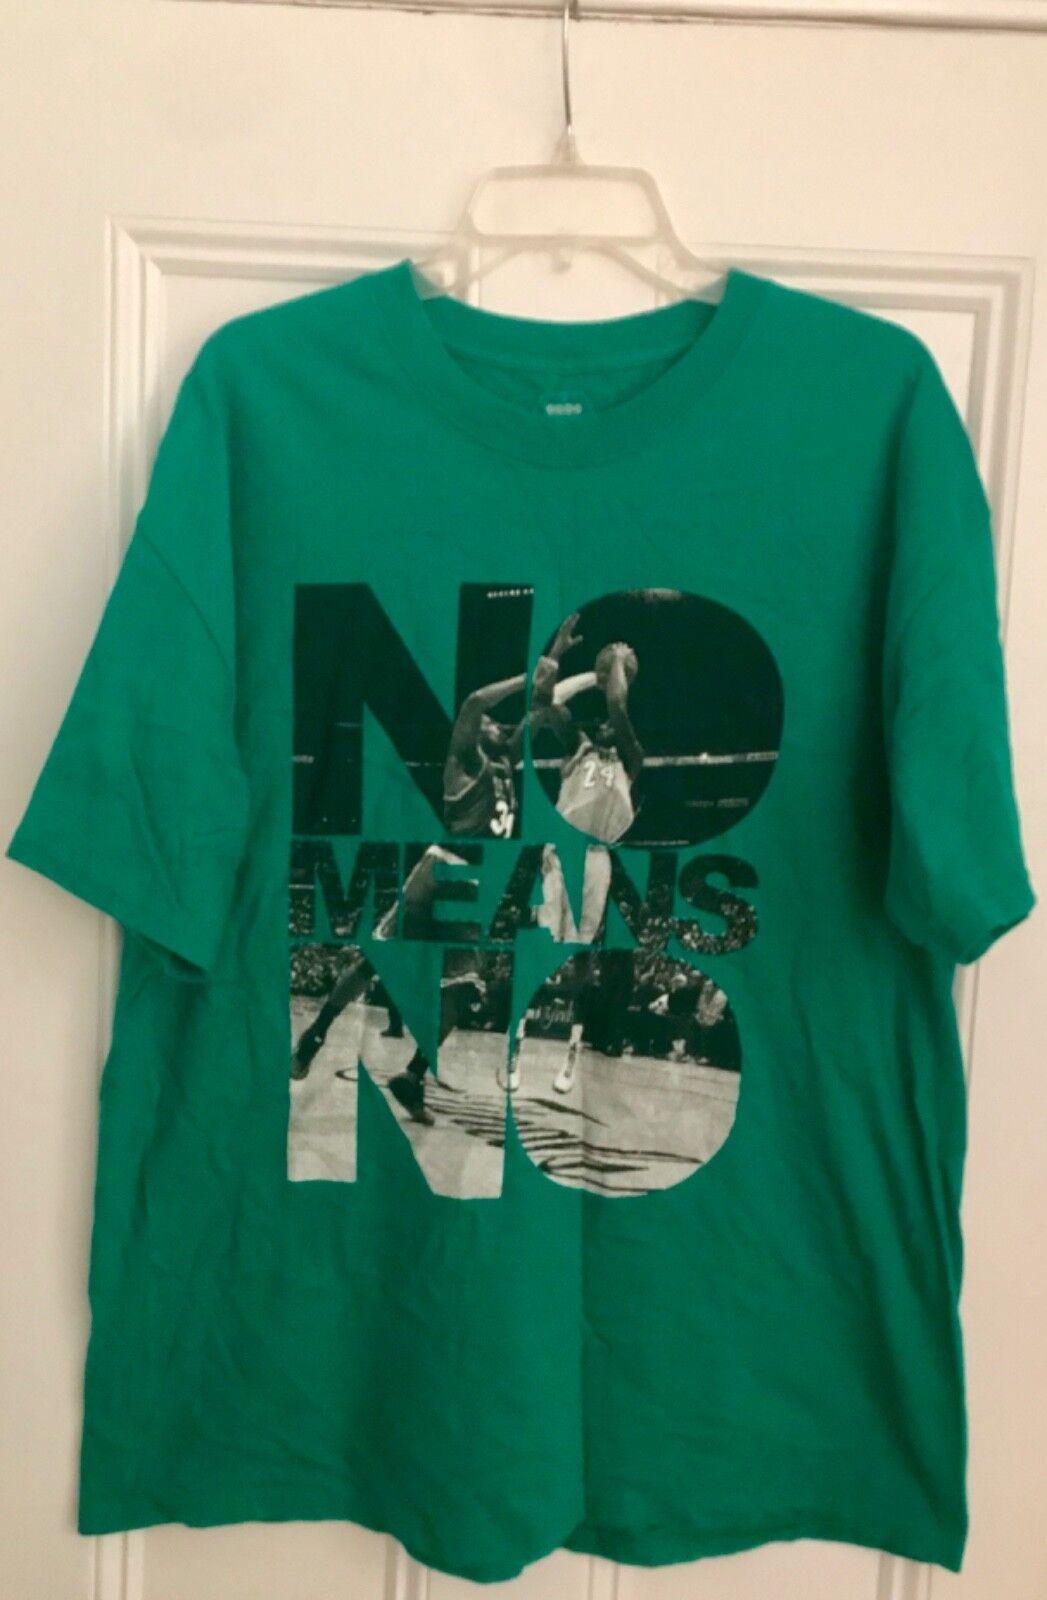 Authentic Bodega BDGA No Means No Paul Pierce Kobe Bryant NBA Finals tee t-shirt